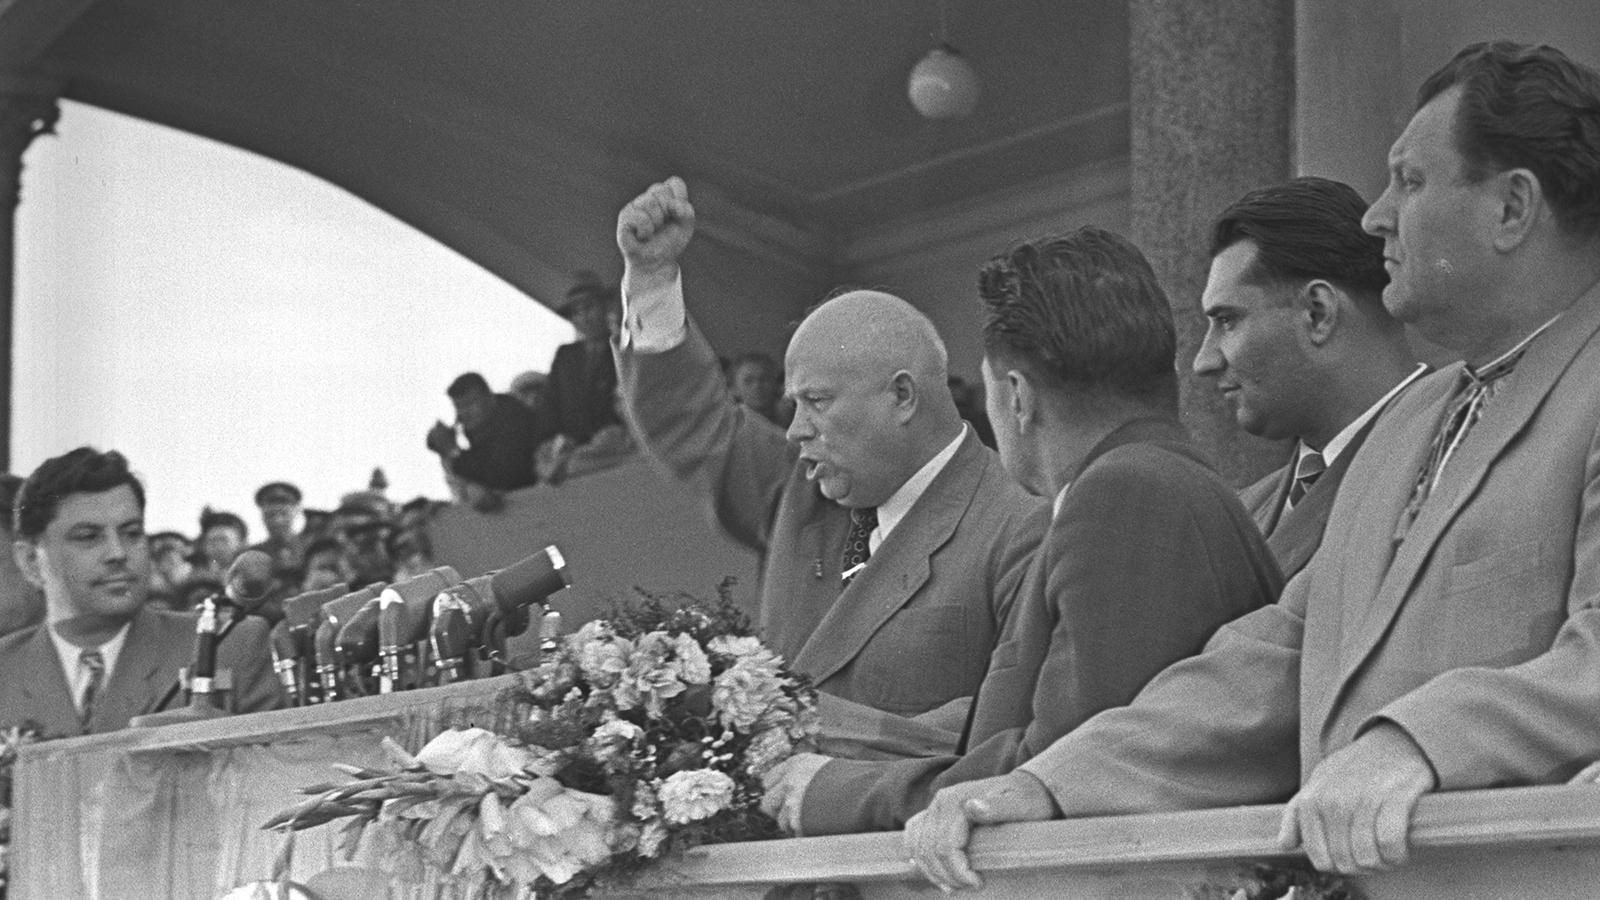 1956 год. Доклад Хрущева о культе личности